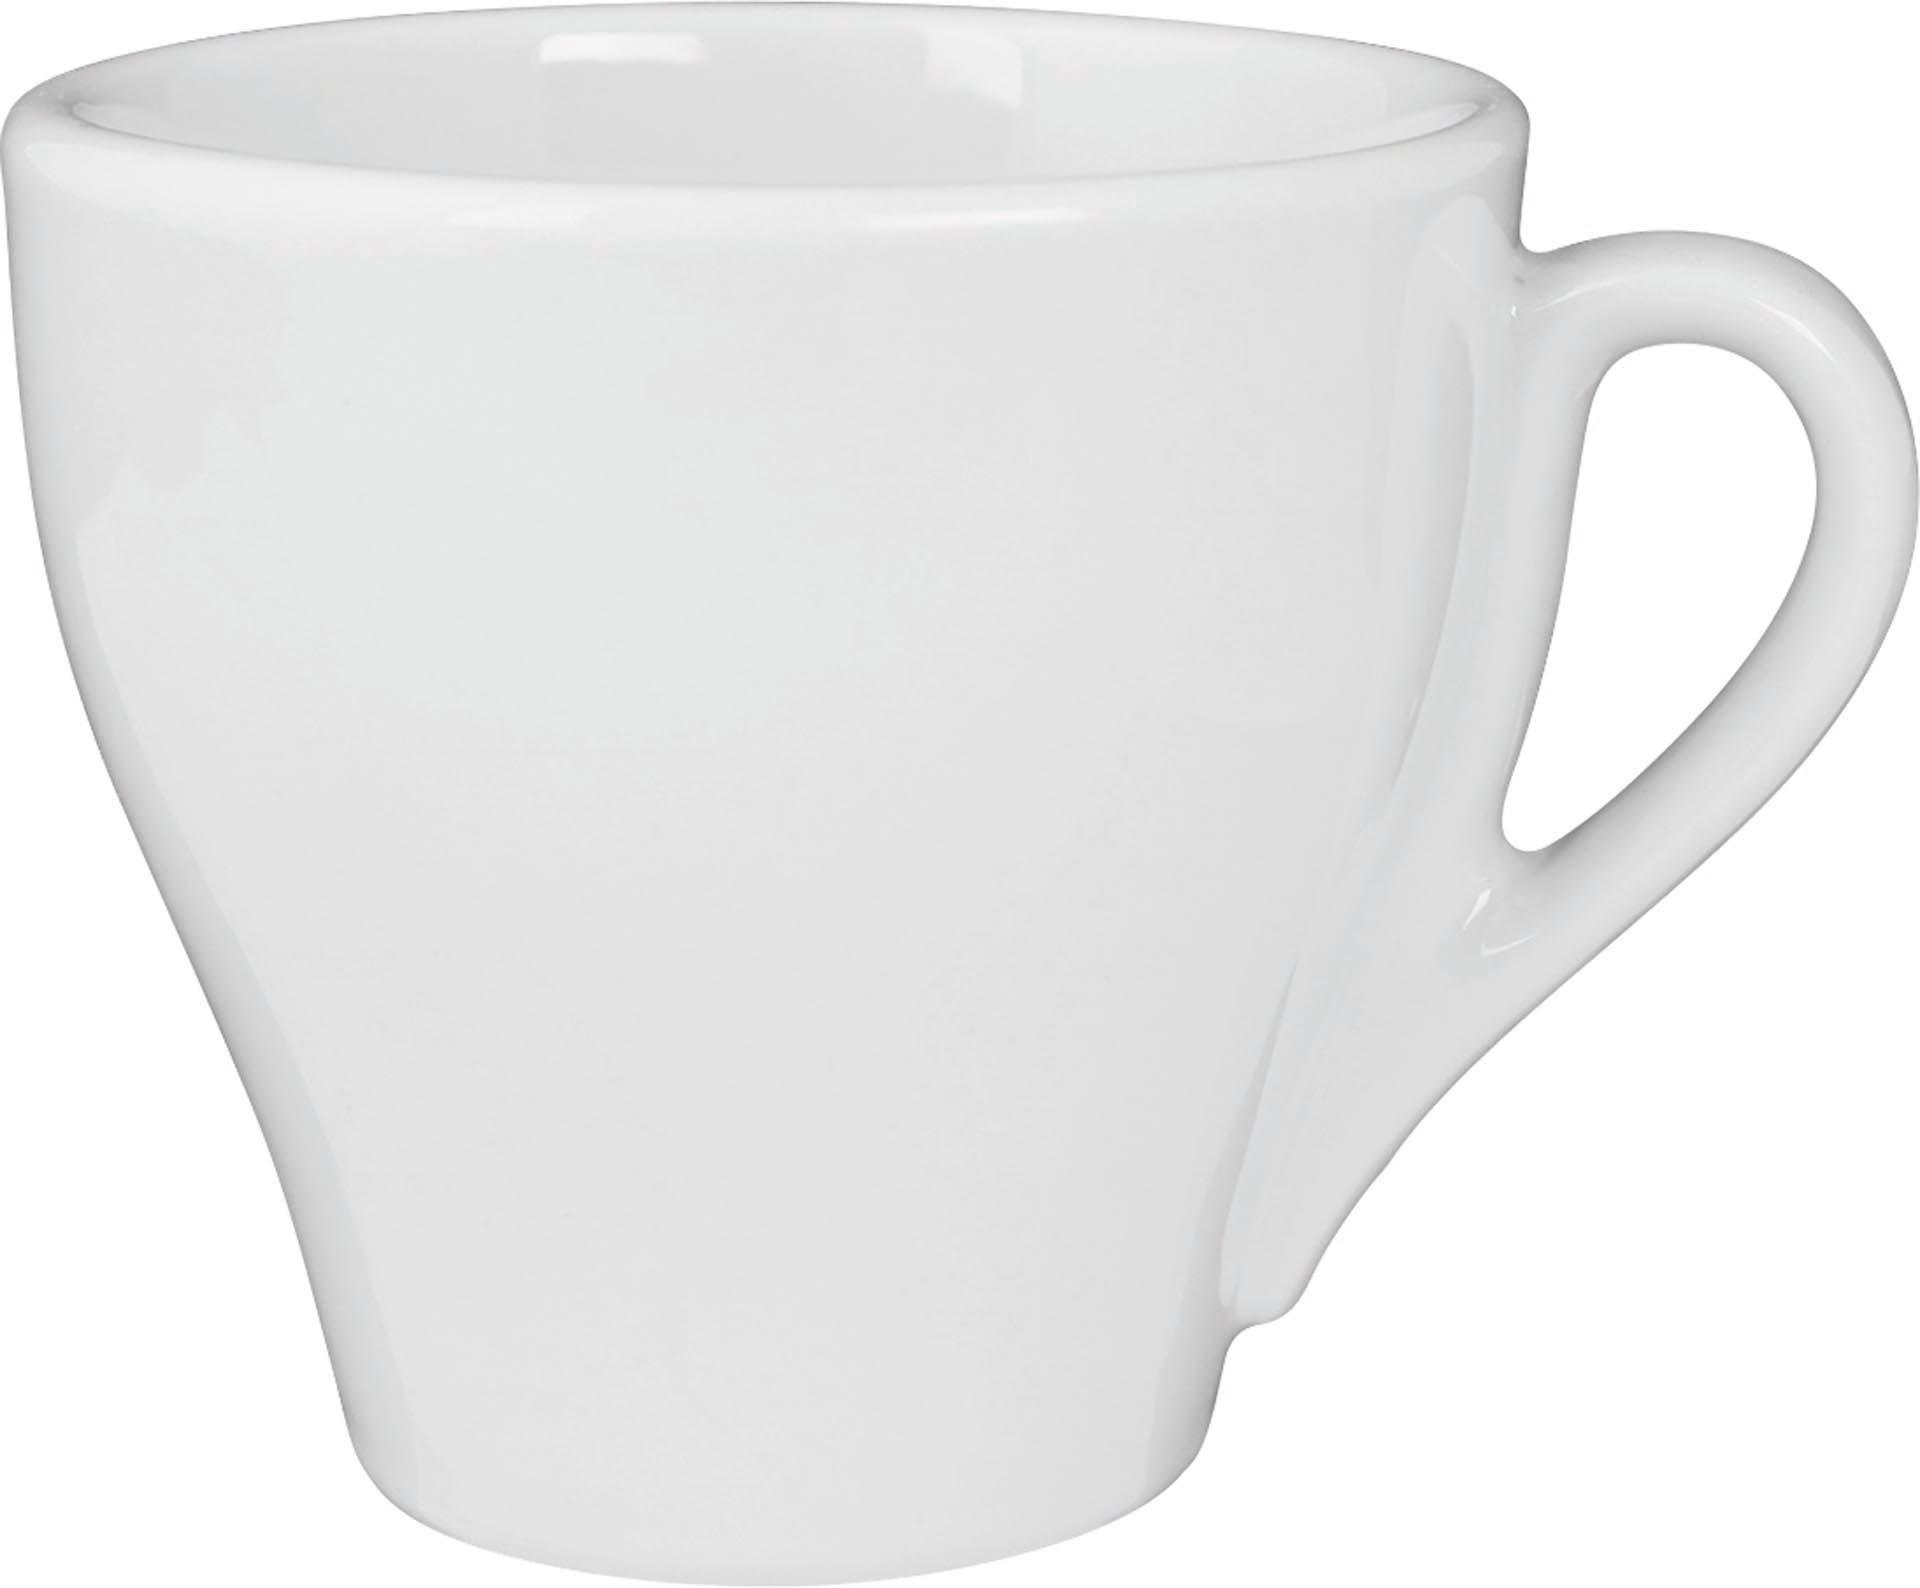 "Kaffee Grande-Tasse ""Café"" 0,35 l"